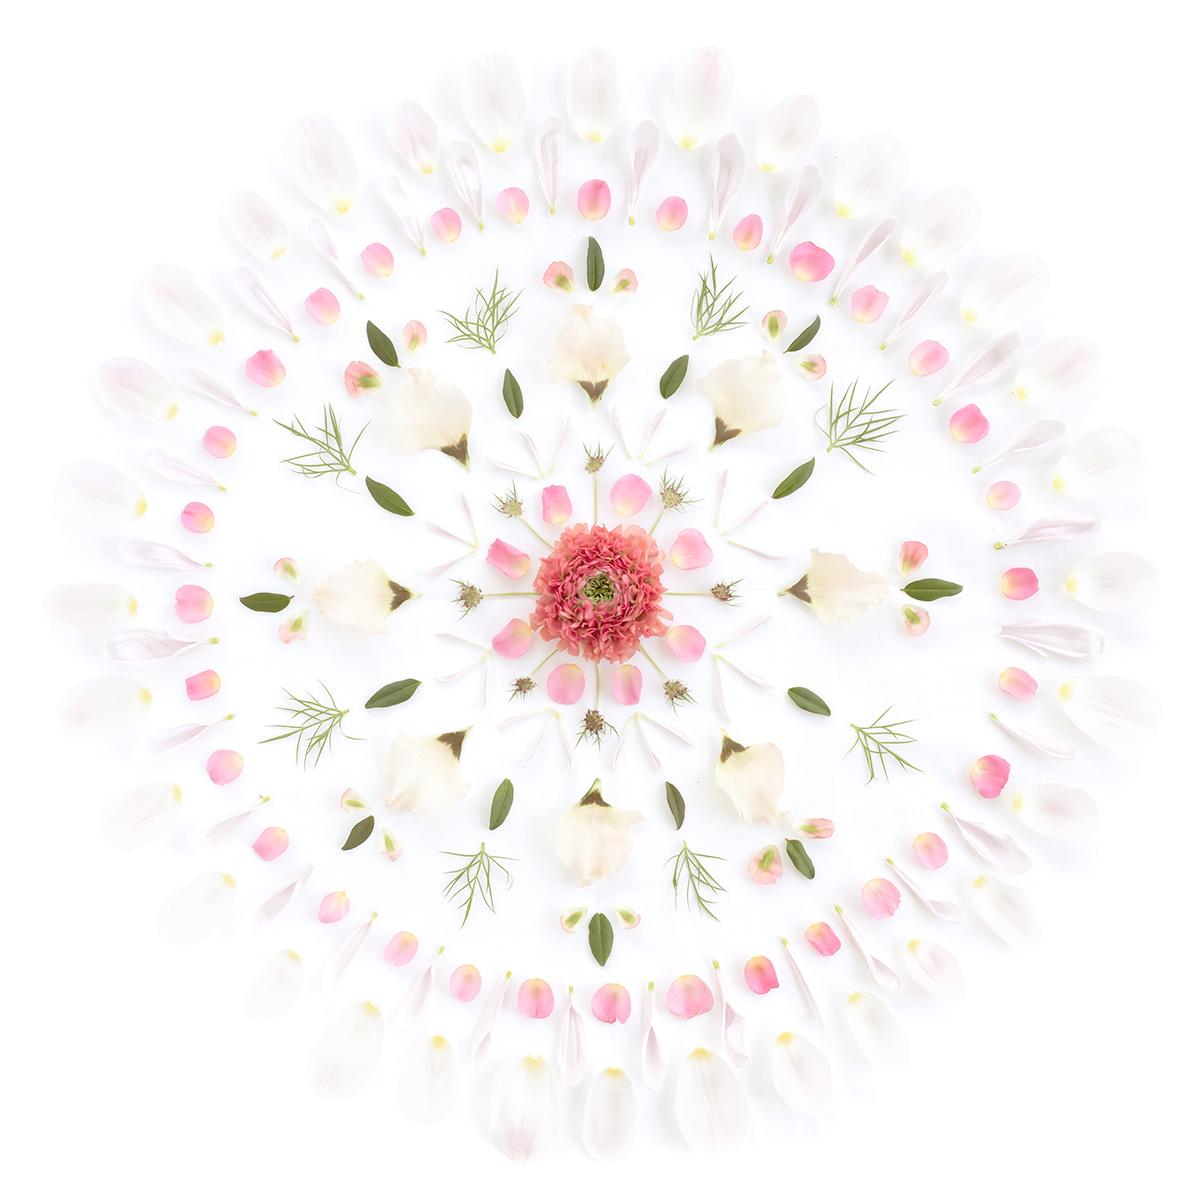 Tapet lavabil Flower Mandala 629-02, Sandberg, 0.81mp / rola